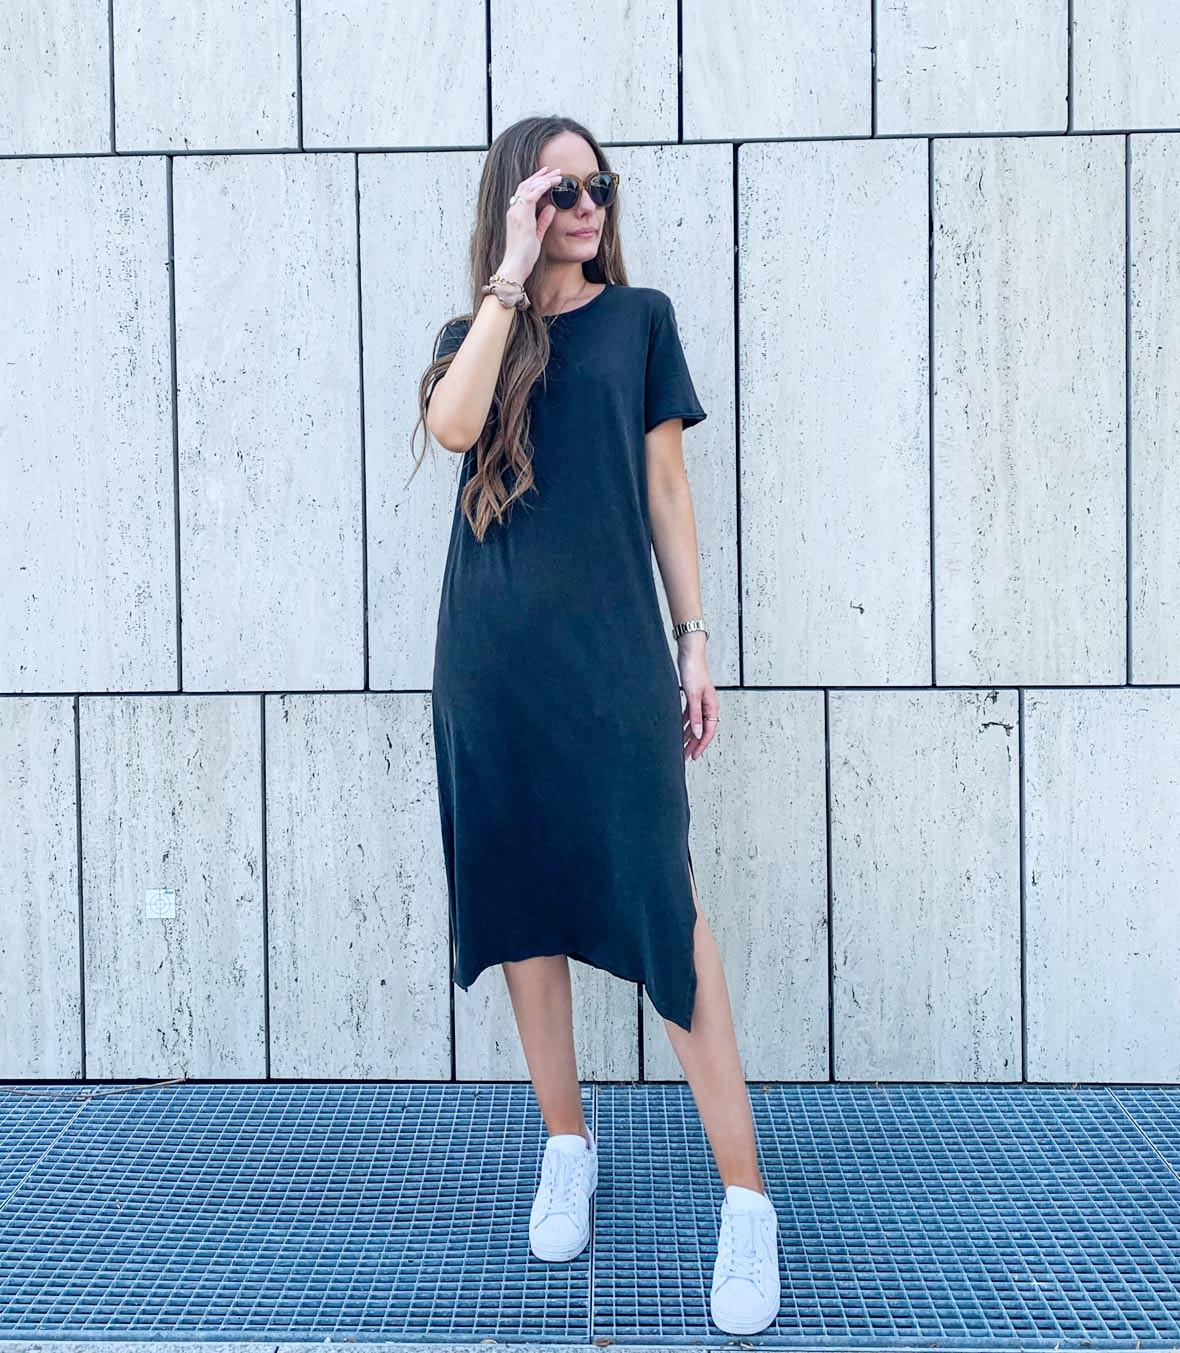 lang t-shirt kjole.jpg